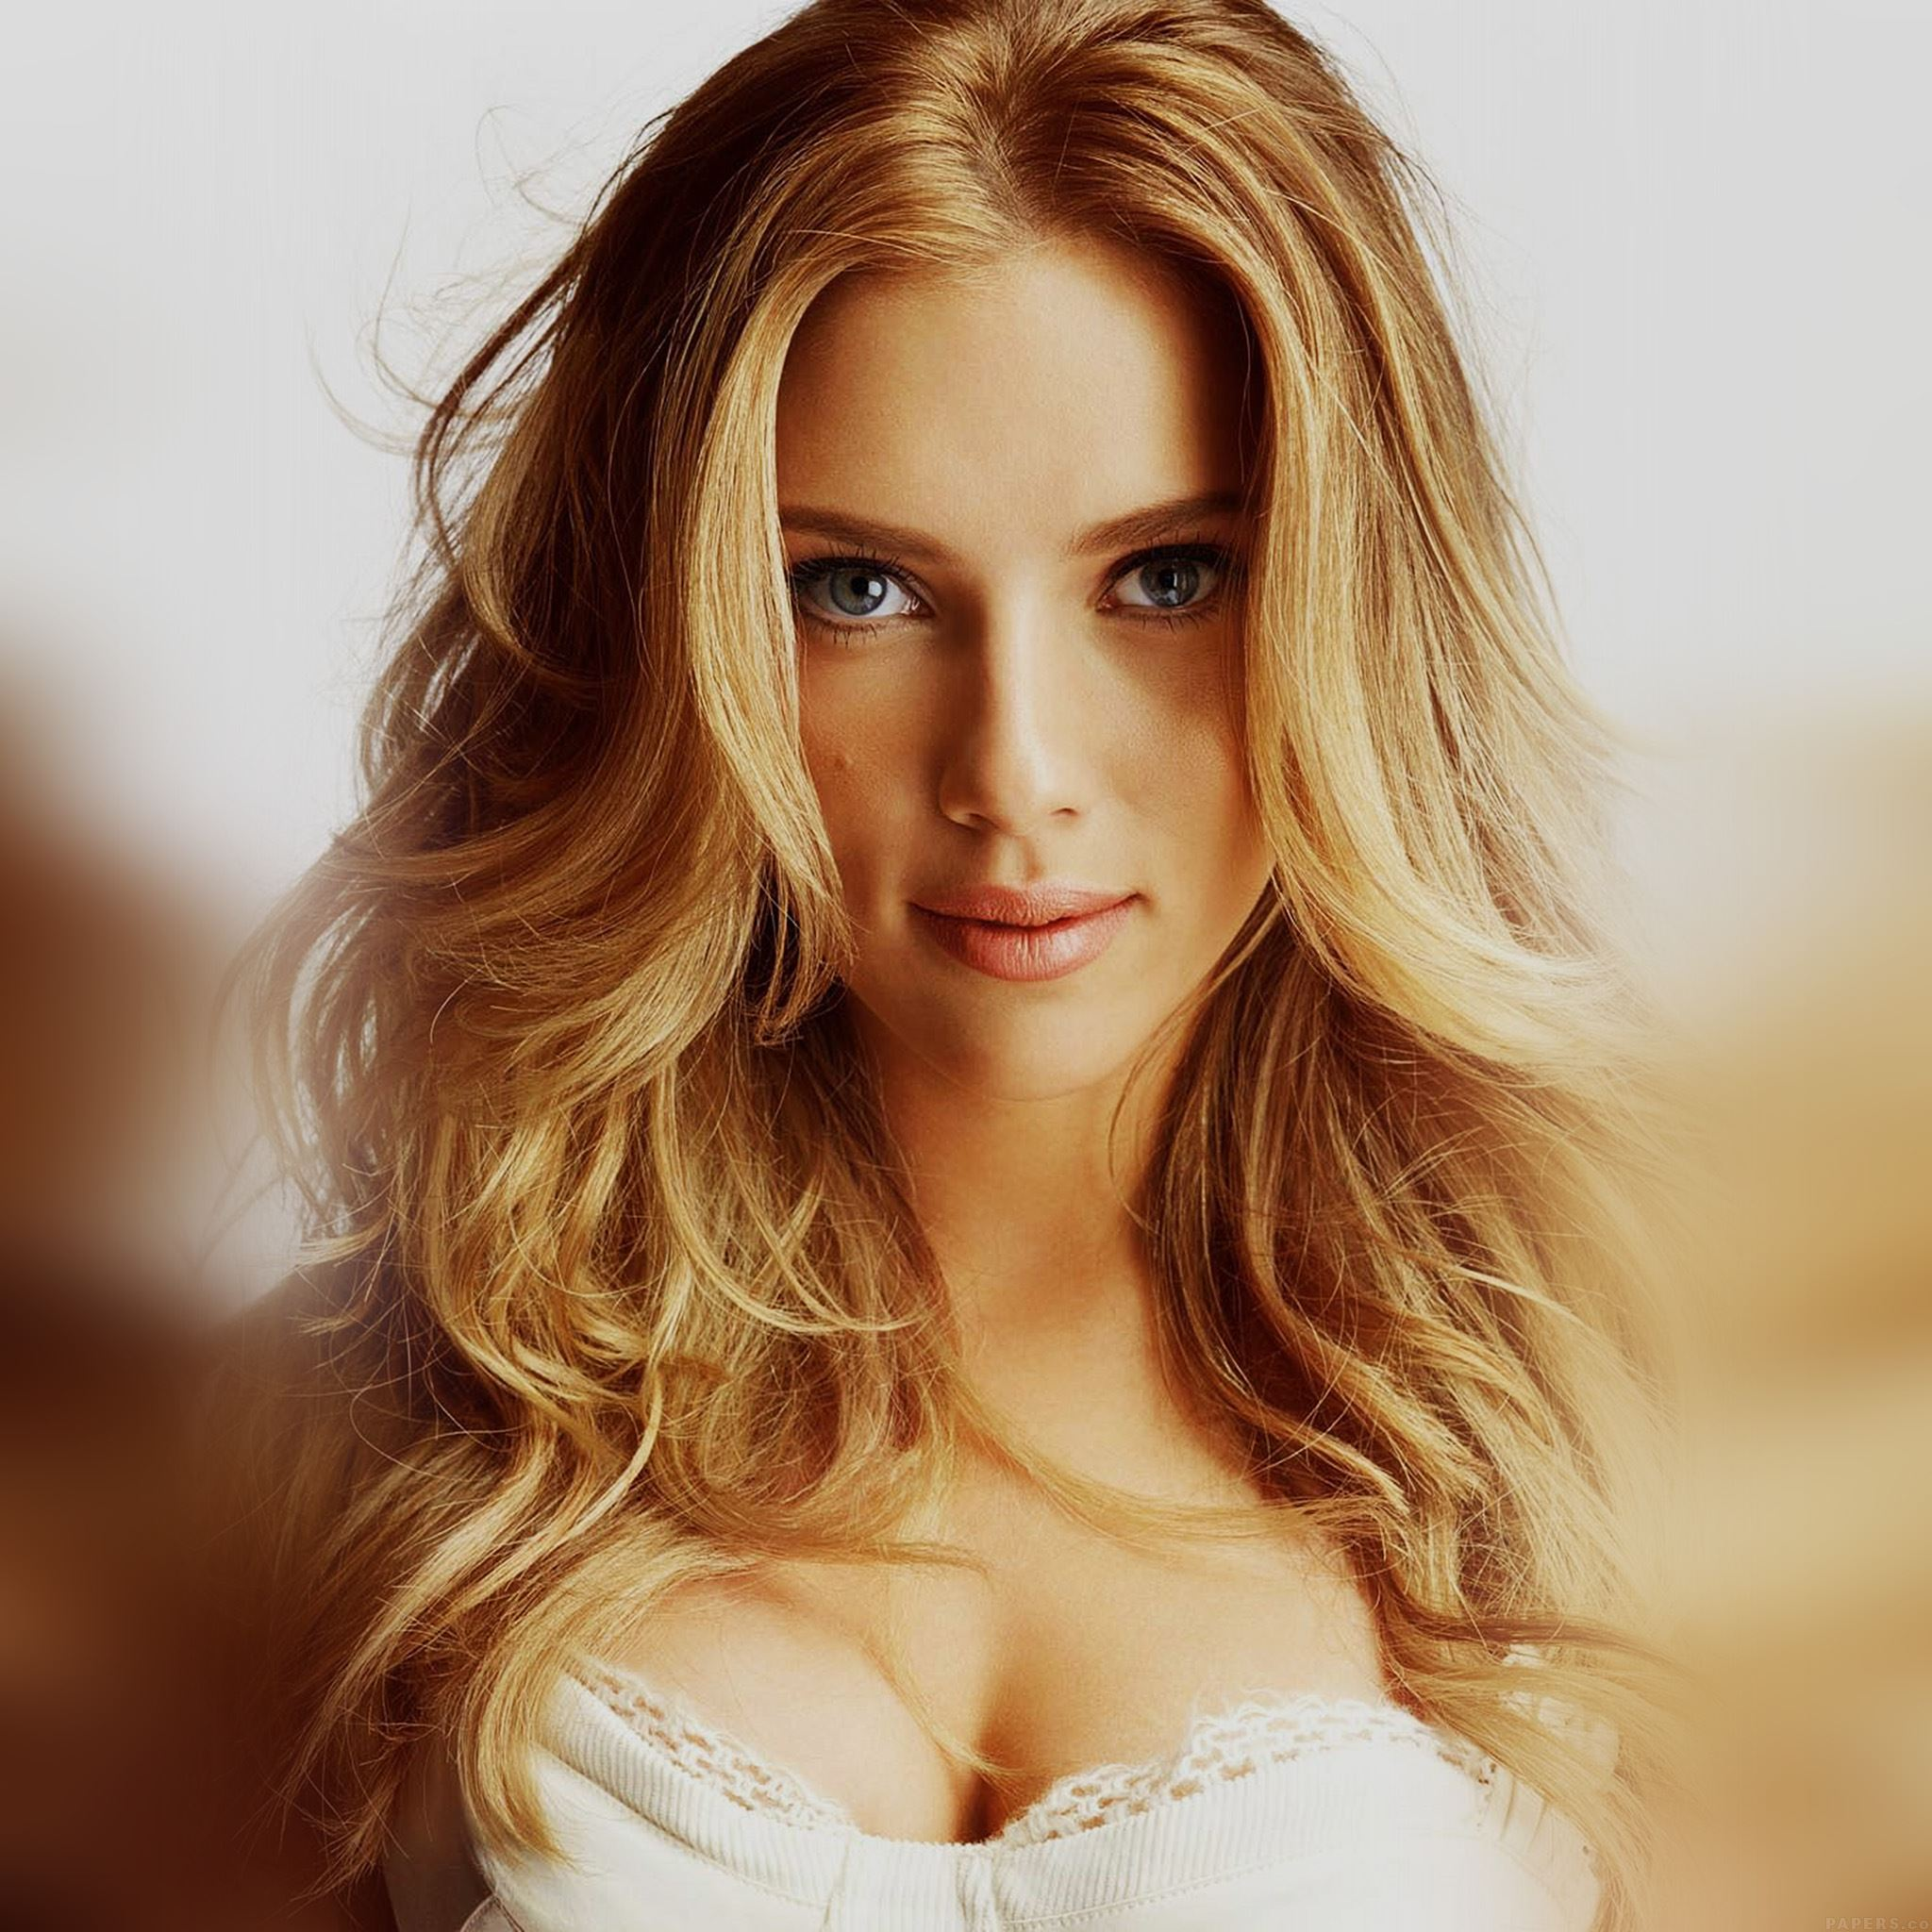 Scarlett Johansson Smile Sexy Celebrity iPad Air Wallpapers 2048x2048